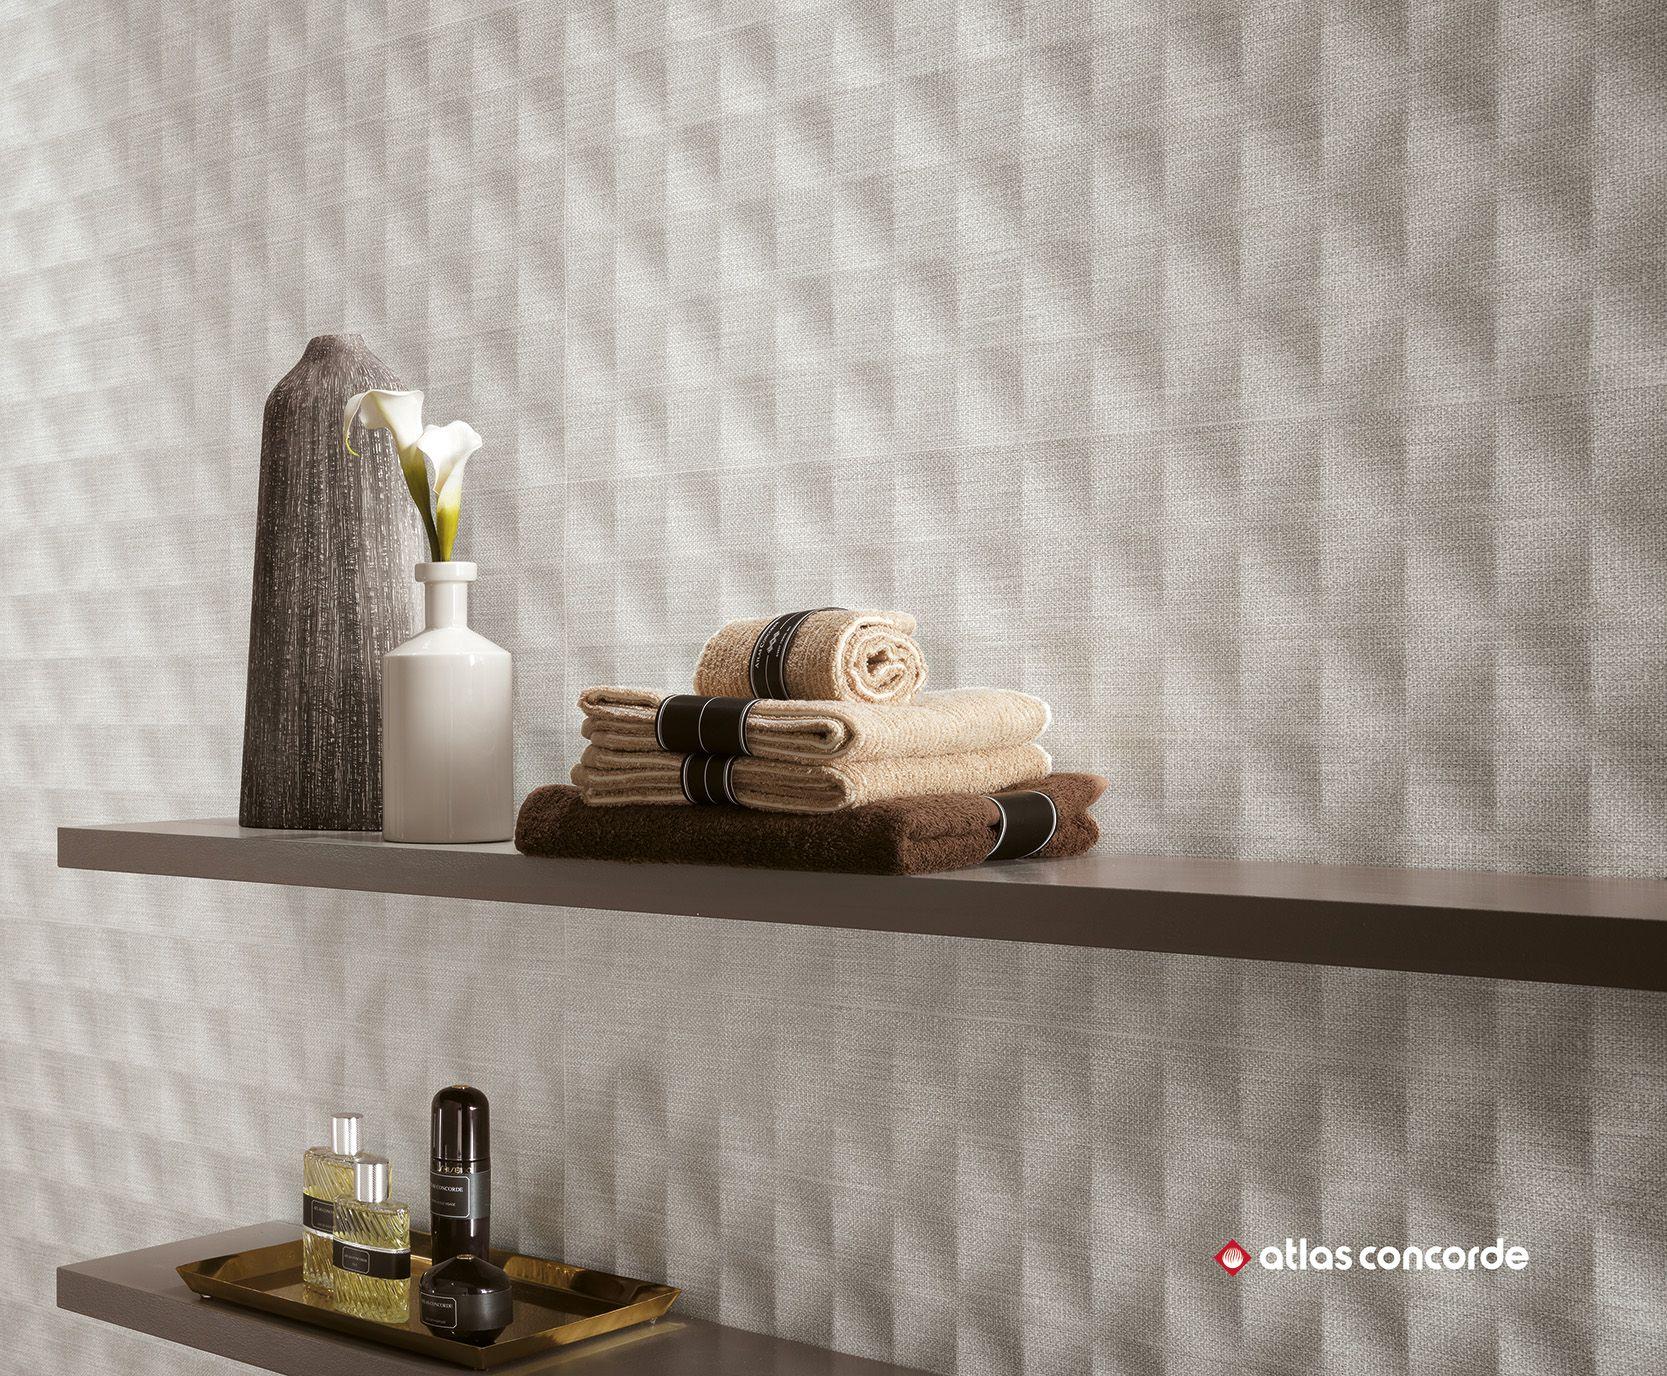 Three Dimensional Ceramic Wall Tiles For Designer Bathrooms Ceramic Wall Tiles Wall Tiles Fabric Decor